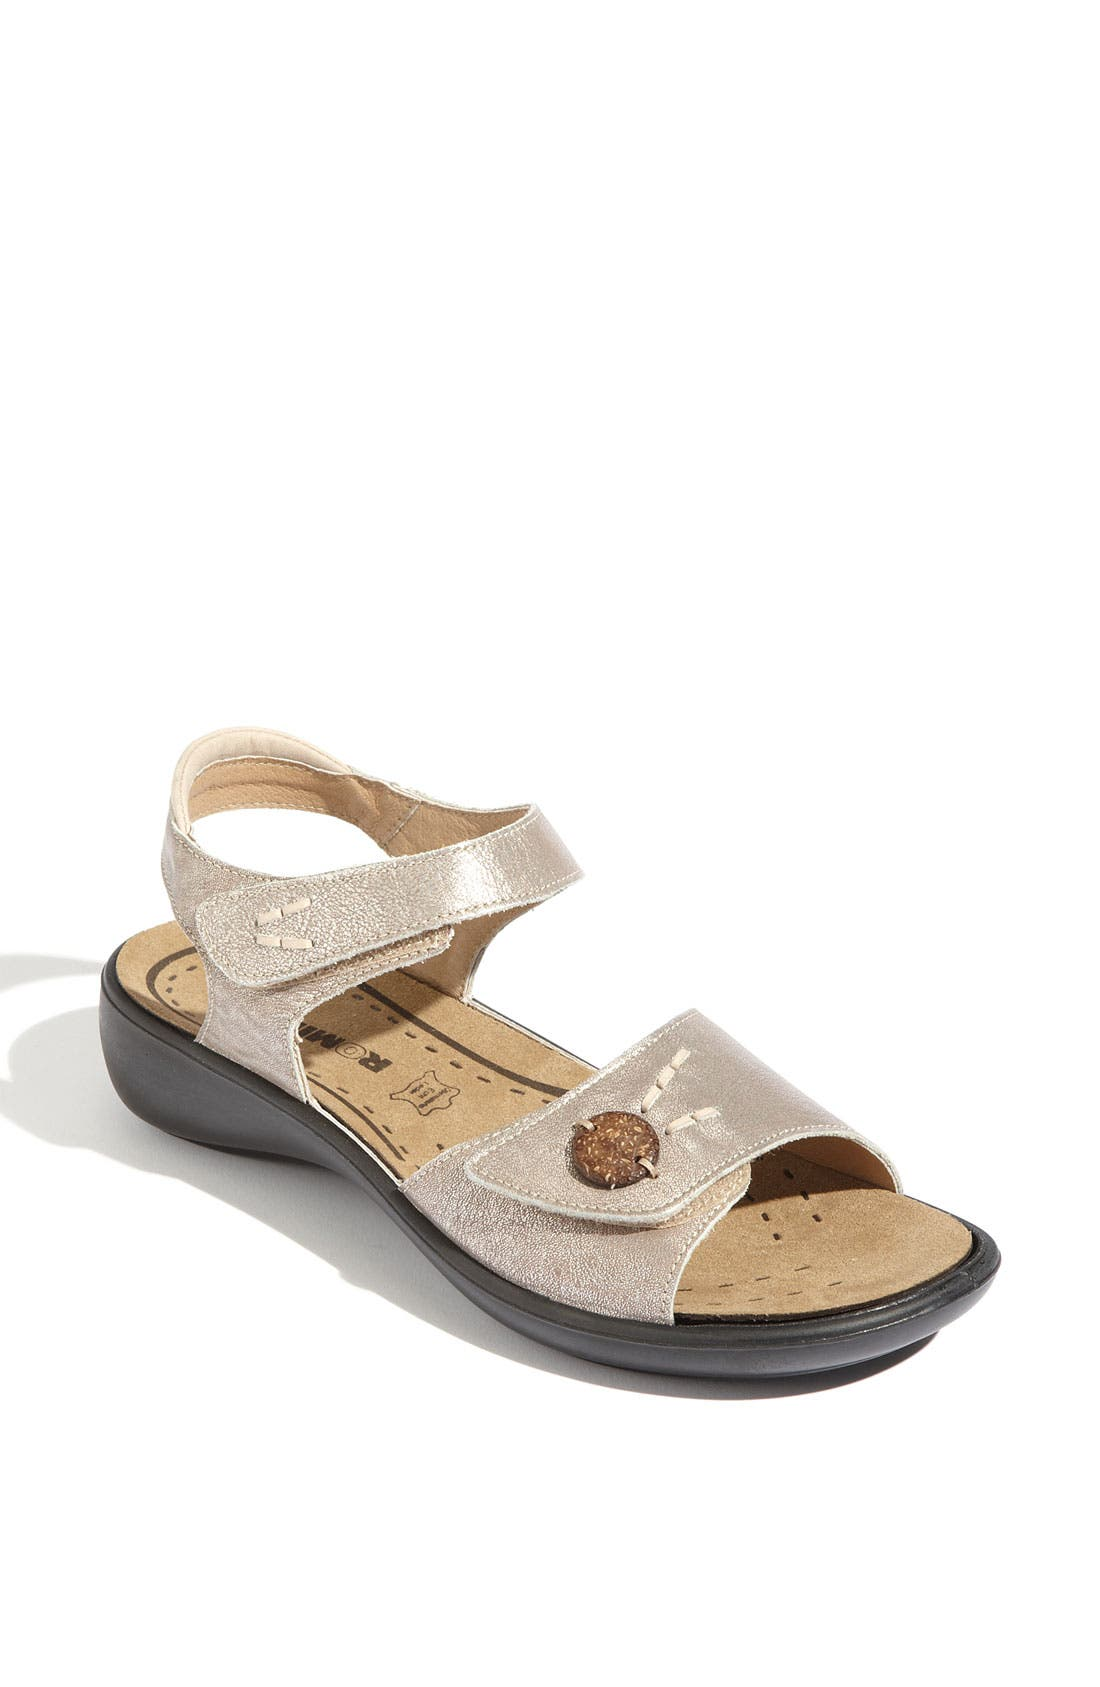 Main Image - Romika® 'Ibiza 34' Sandal